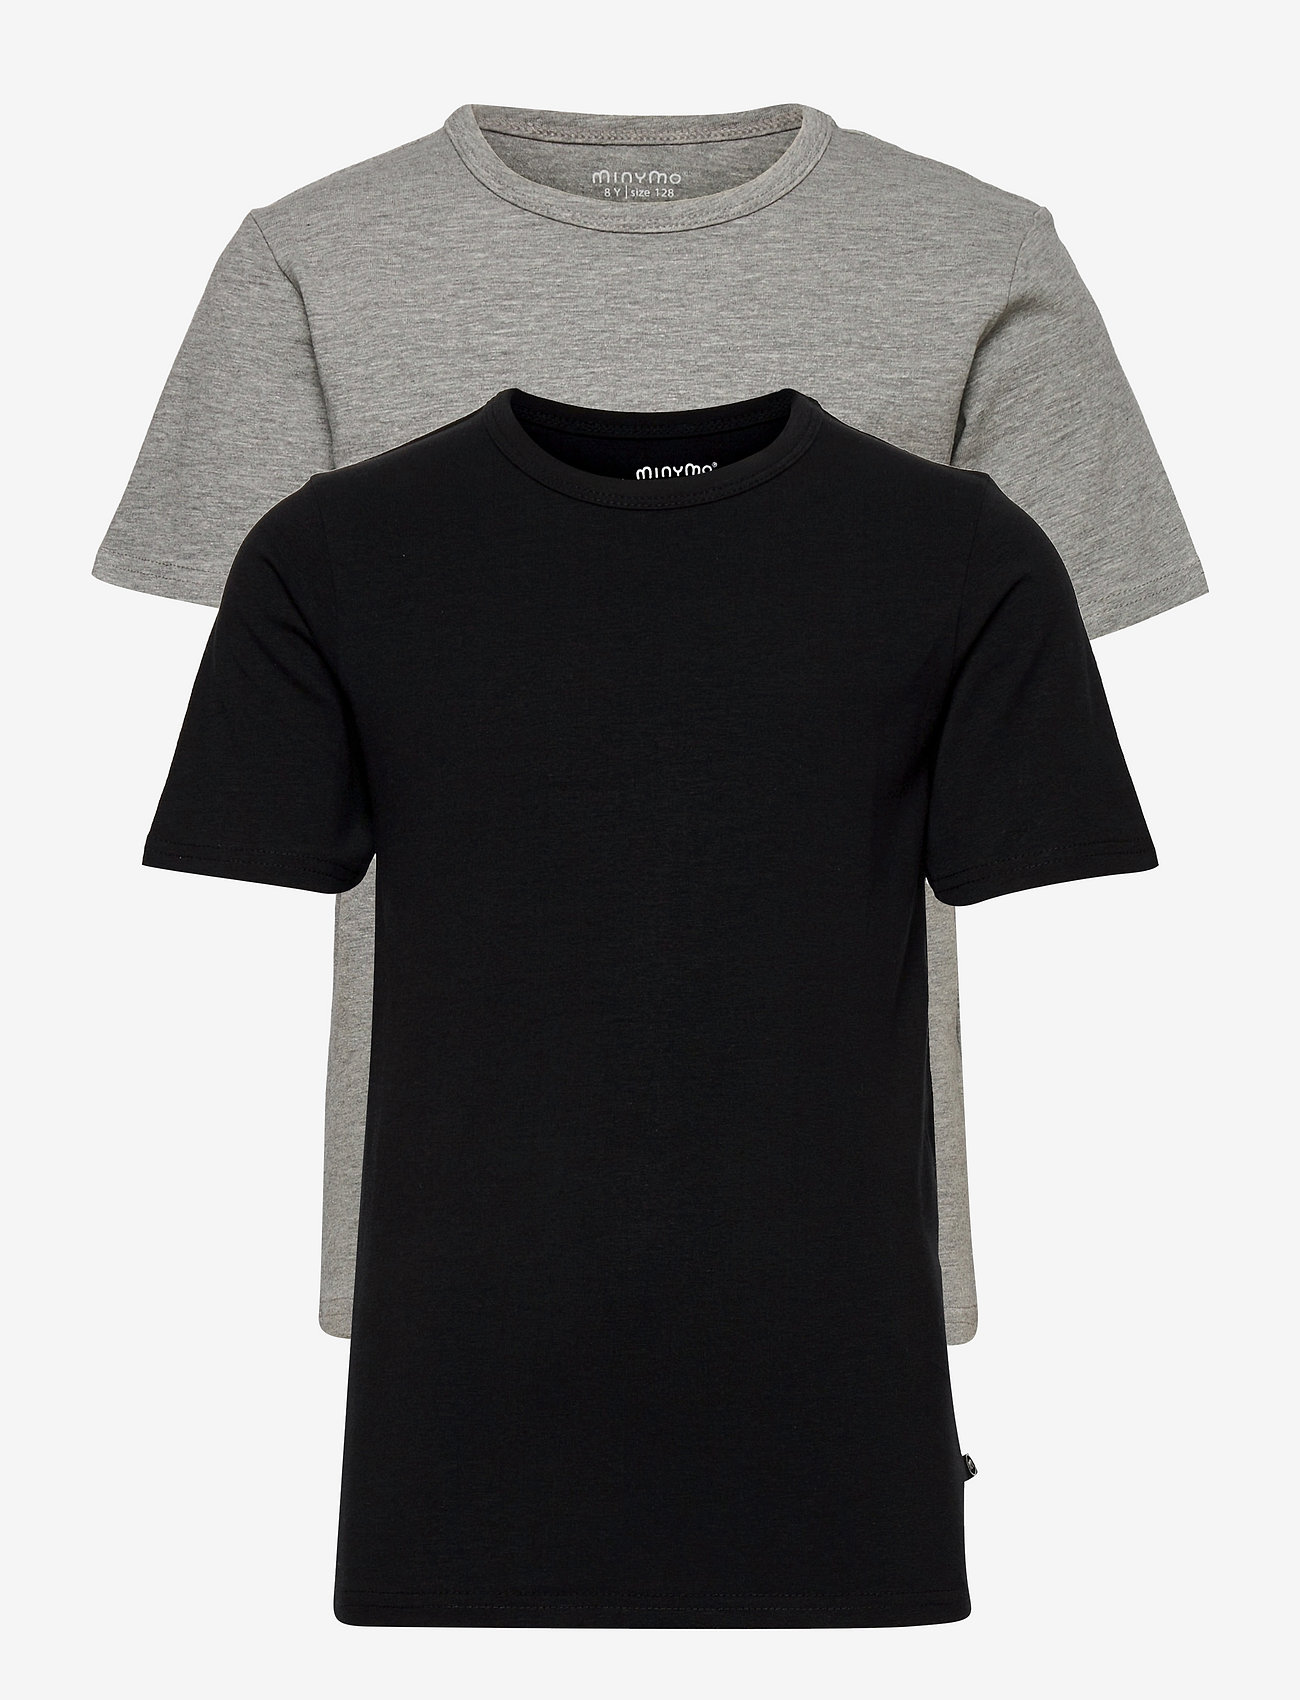 Minymo - Basic 32 -T-shirt SS (2-pack) - krótki rękaw - anthacite black - 0